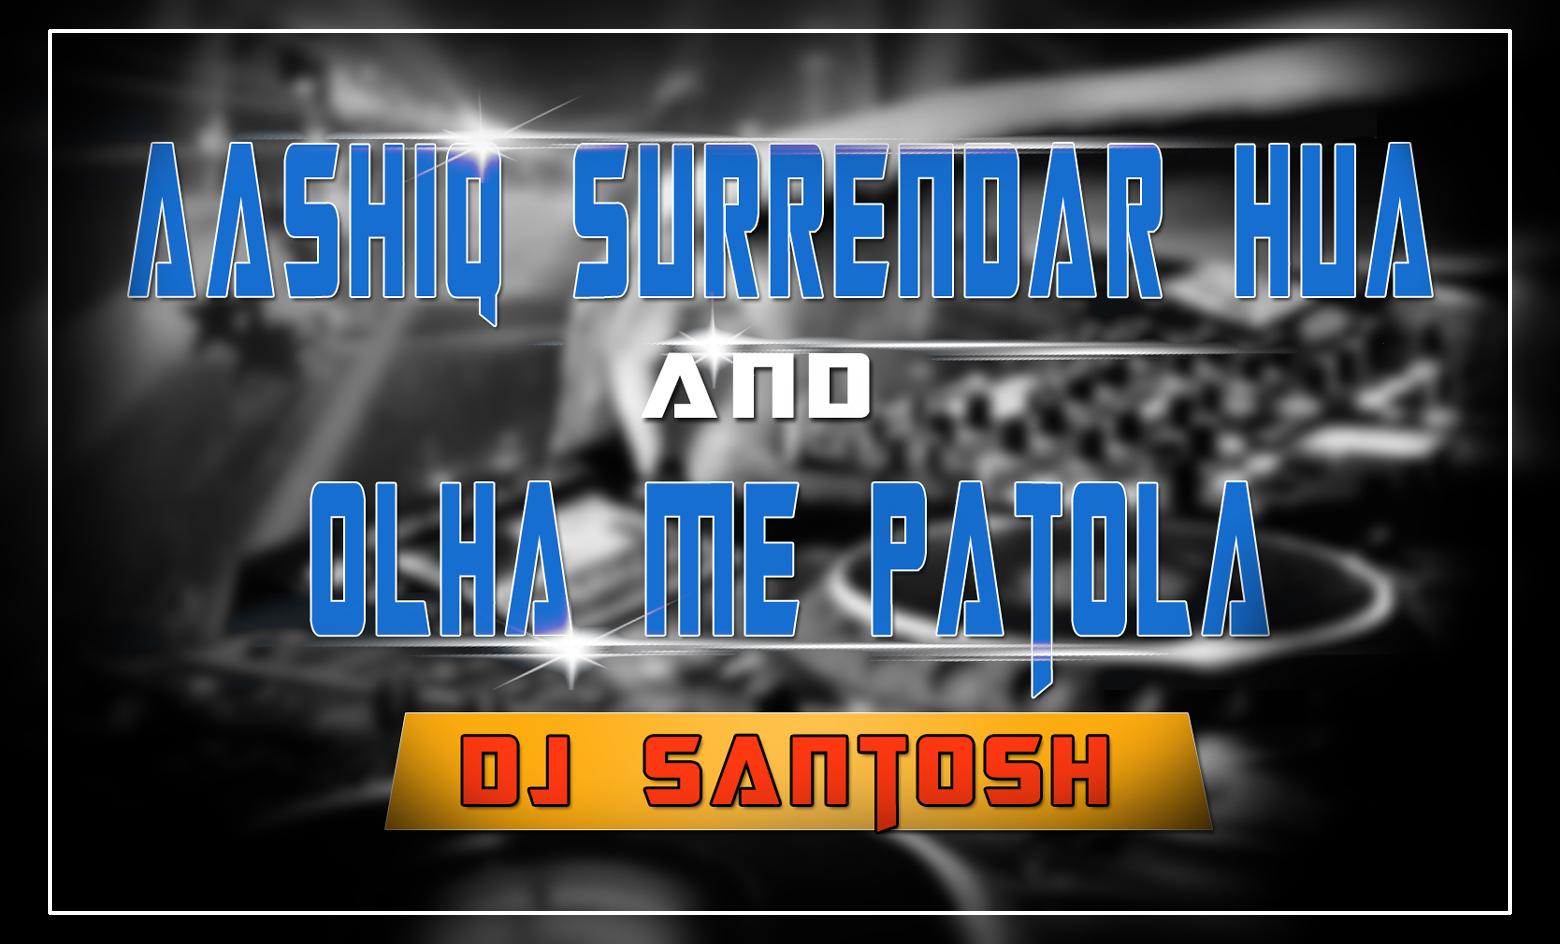 DJ SANTOSH JHANSI: 2 Dance Song - Dj Santosh Jhansi